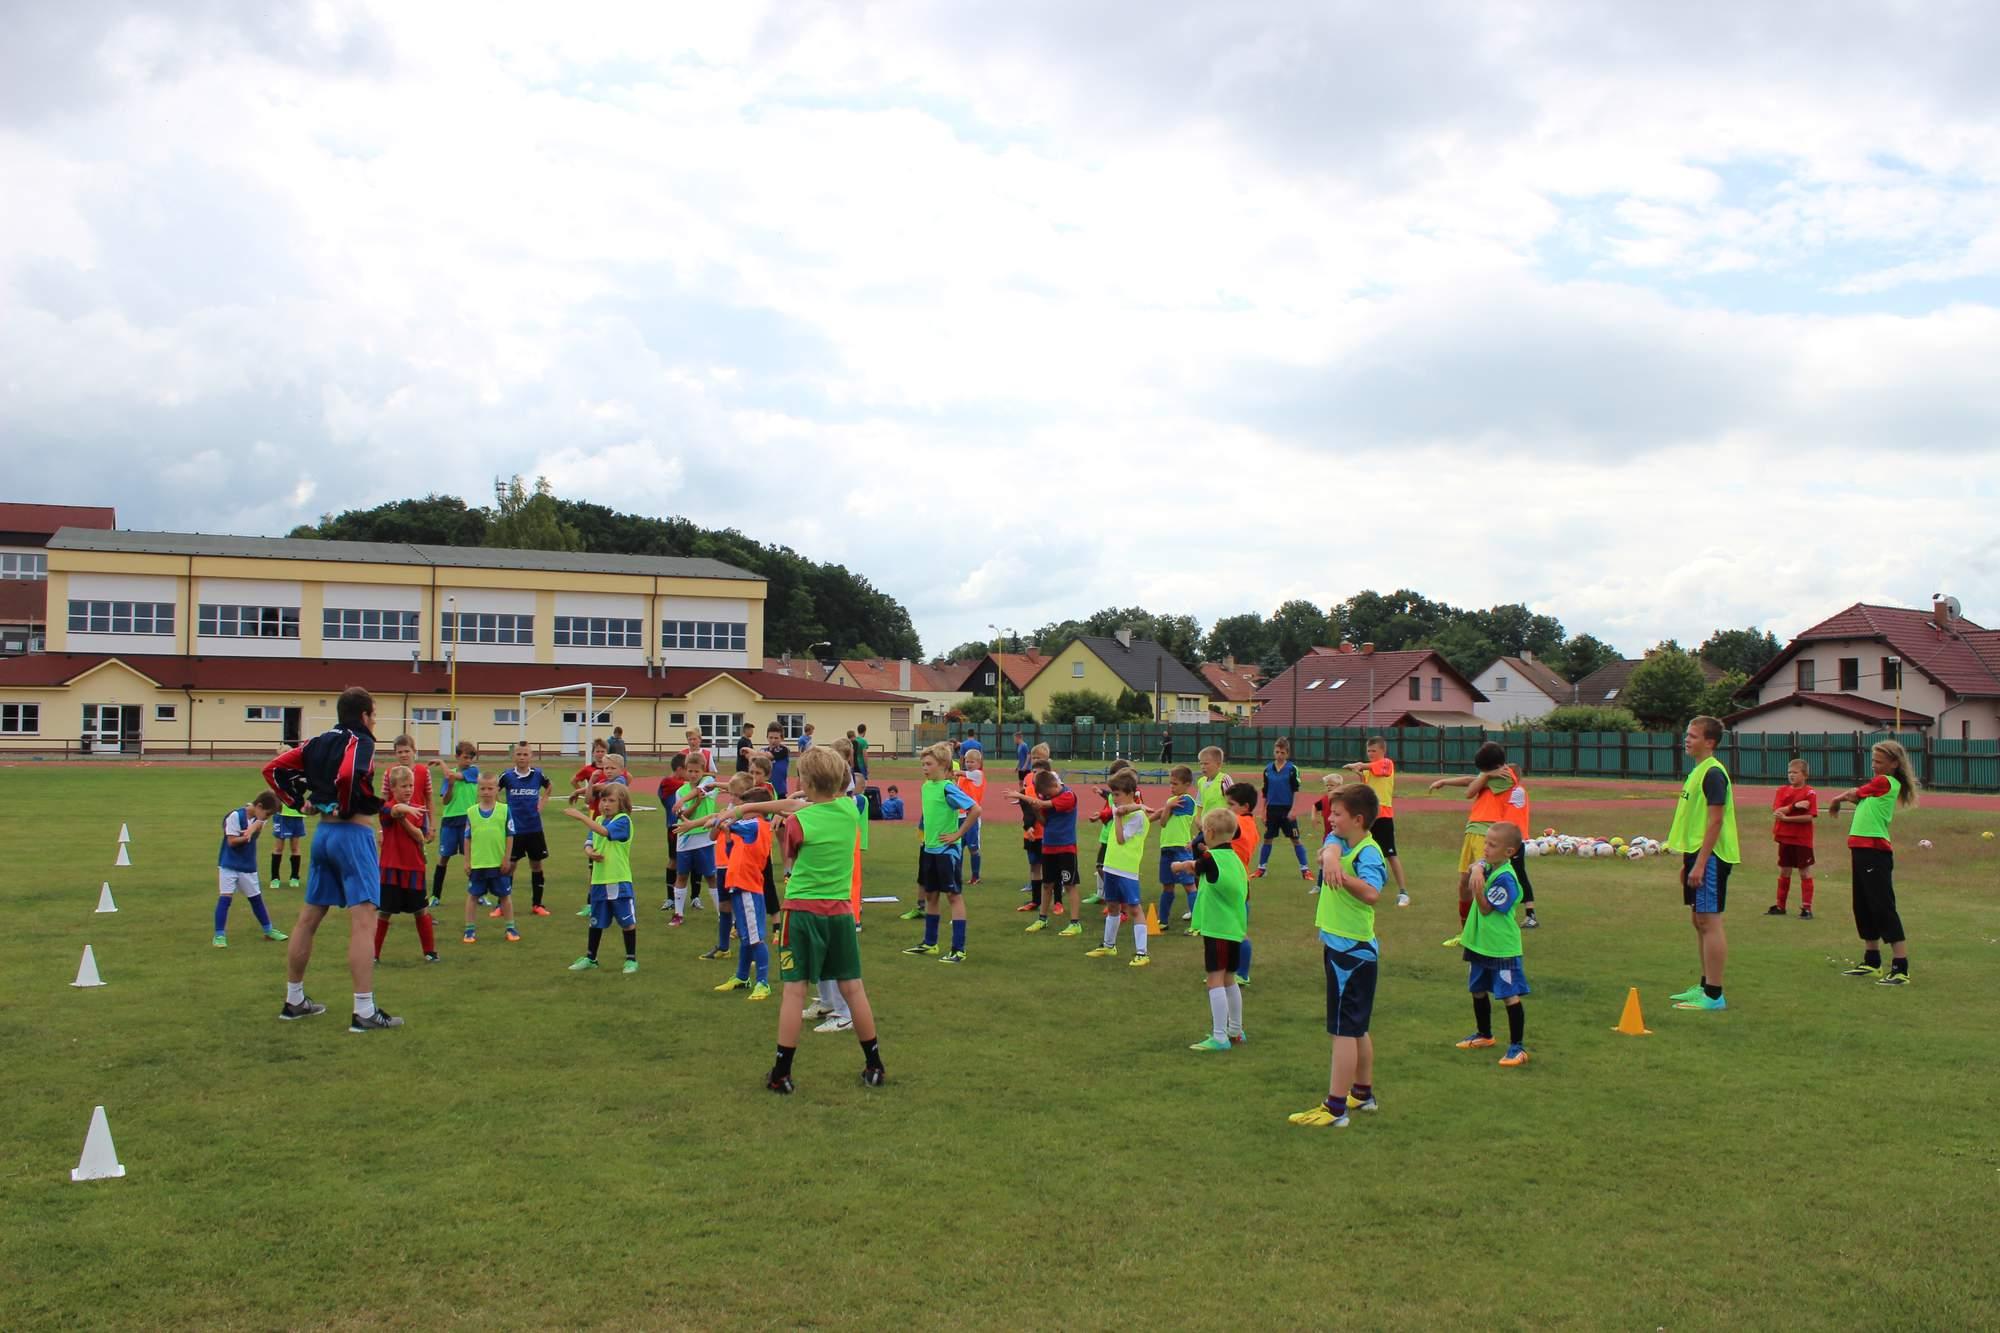 Fotbalové prázdniny Fotbalový kemp Fotbalové Prázdniny 2014 Rocvička